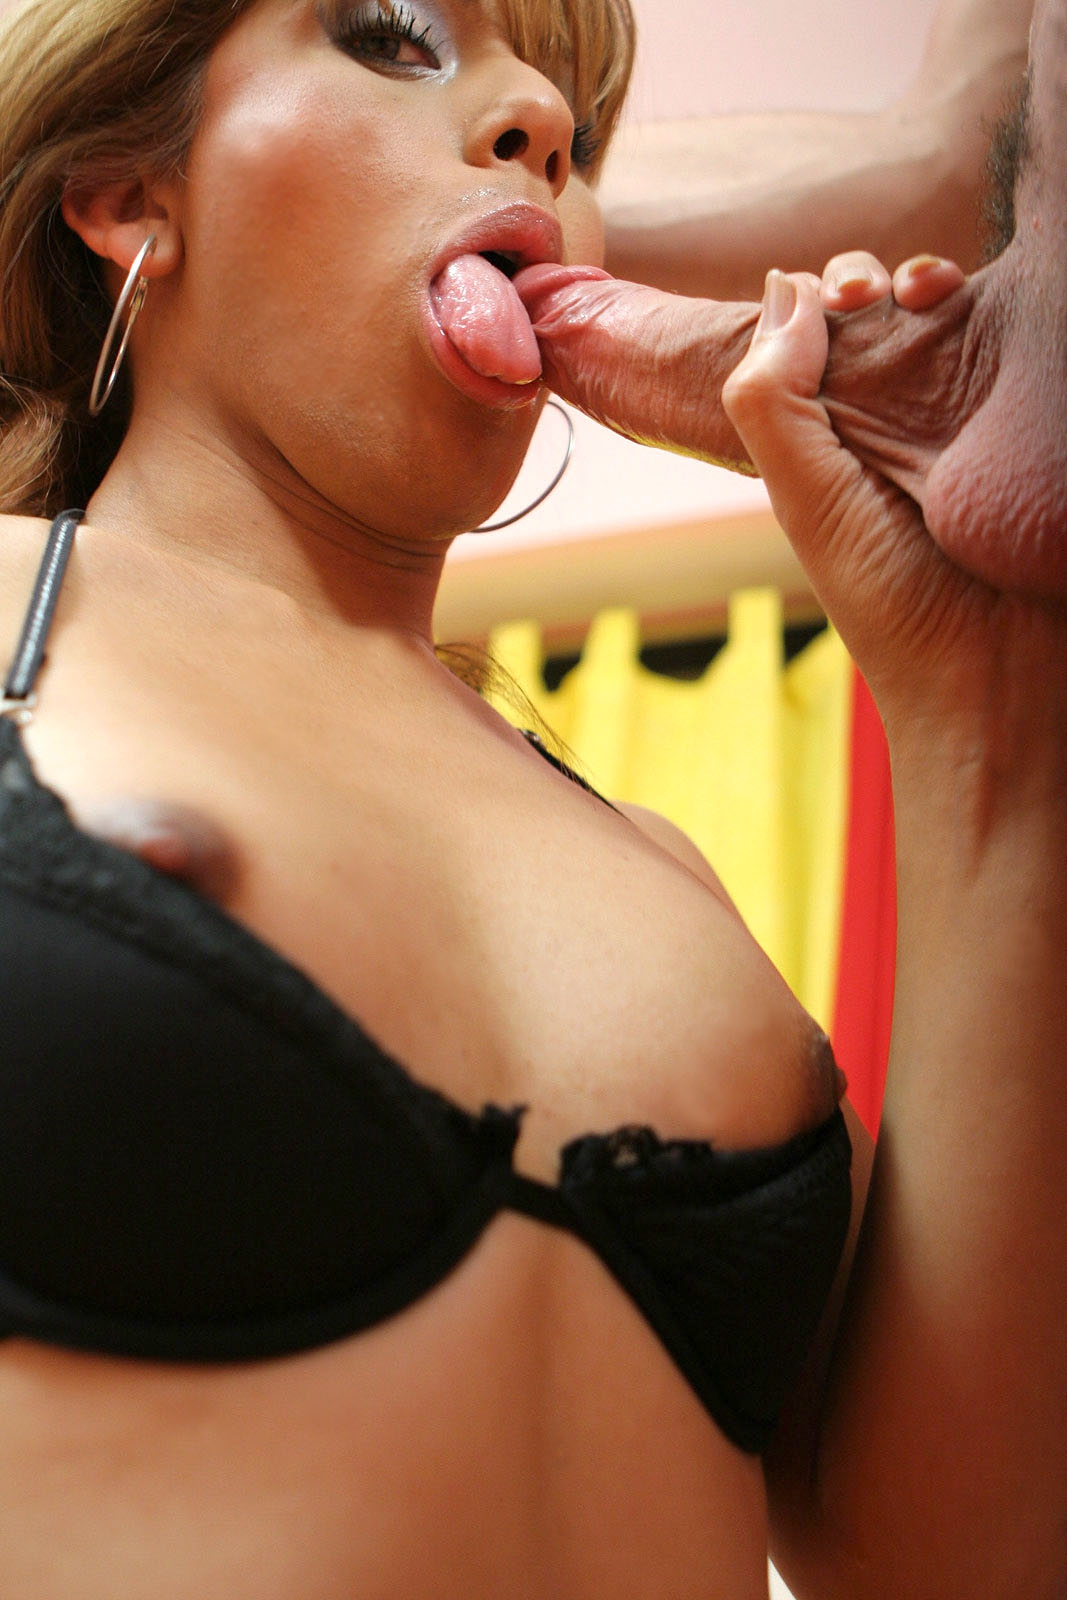 Fotos porno-edition blowjob mit schimpfwörter porno-videos